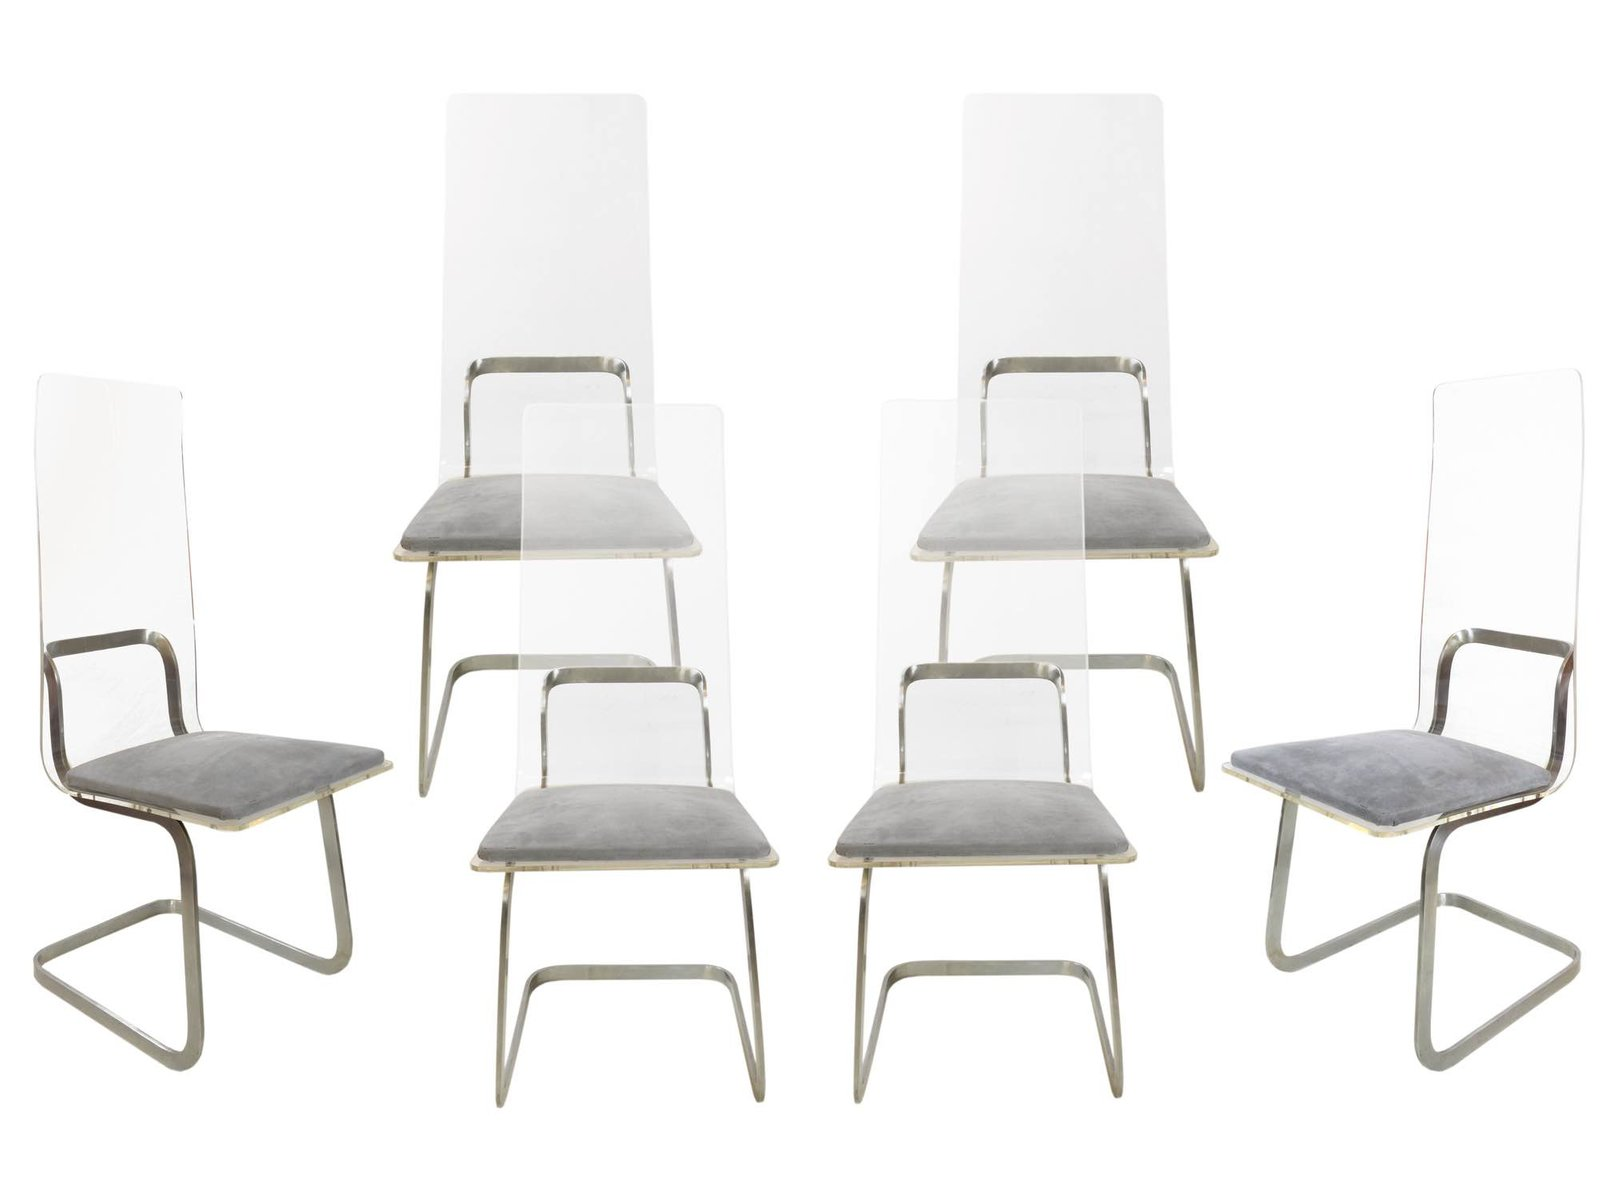 Metal U0026 Plexiglass Chairs By Gary Gutterman, 1970s, Set Of 6